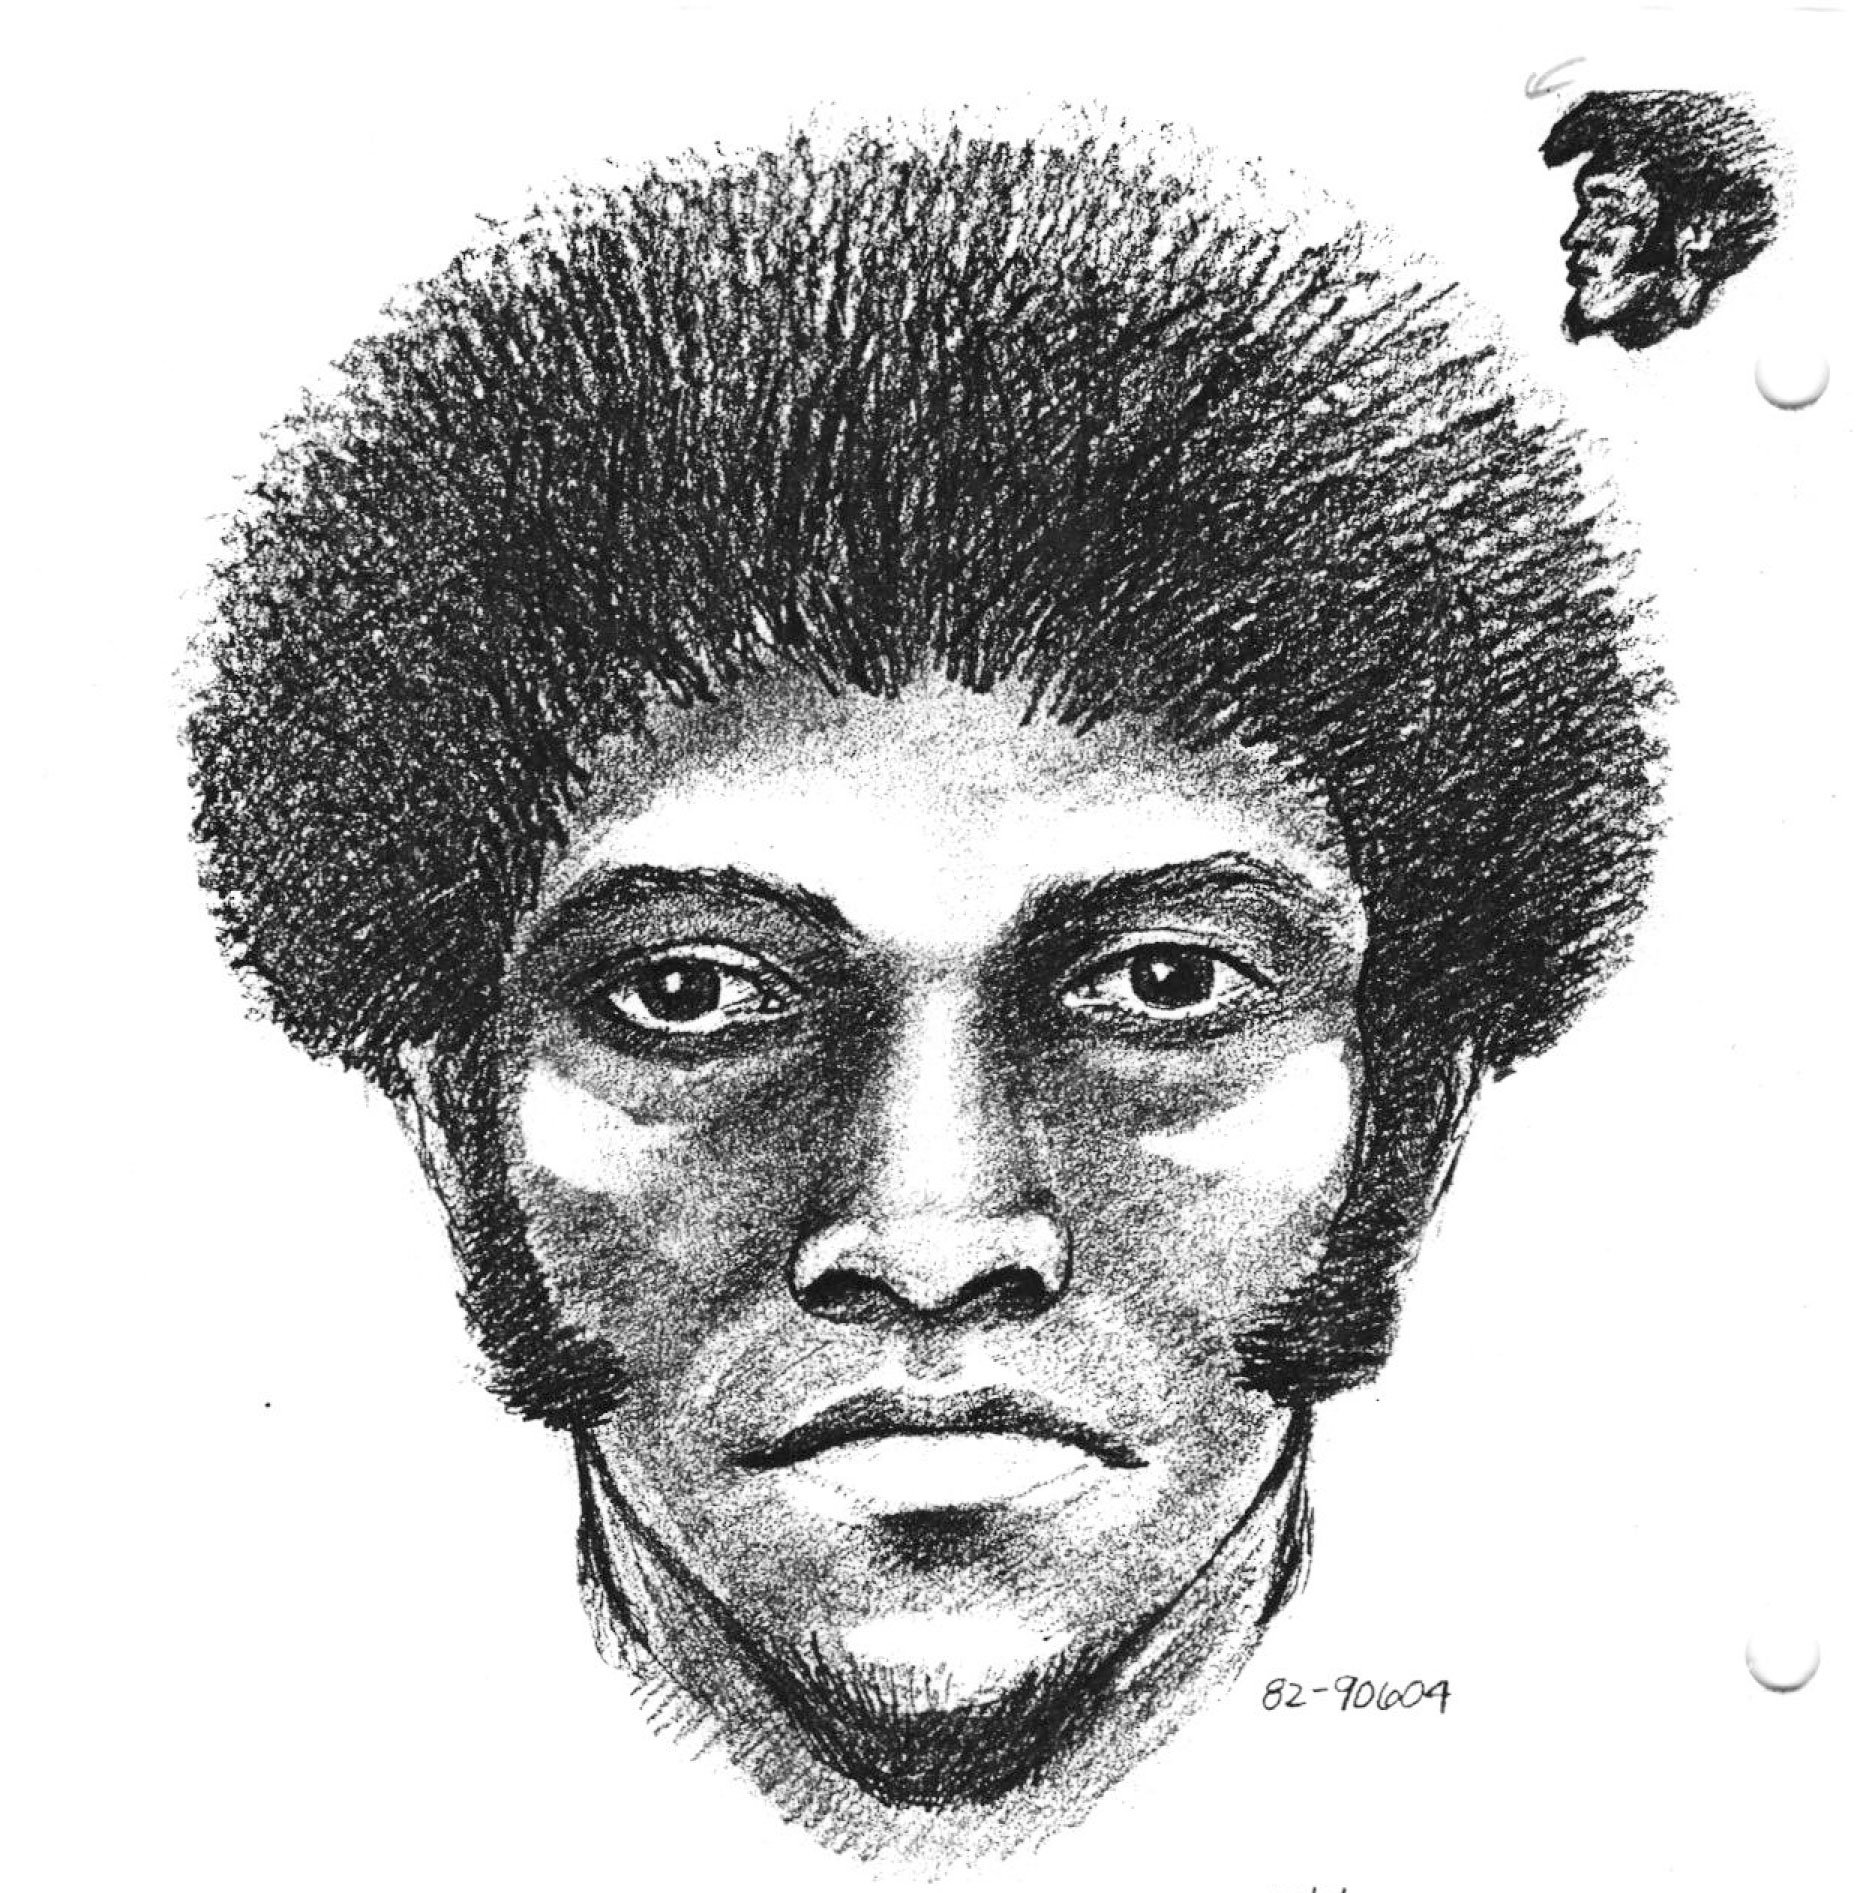 Suspect sketch of Robbie Altom's killer released by police in 1982.